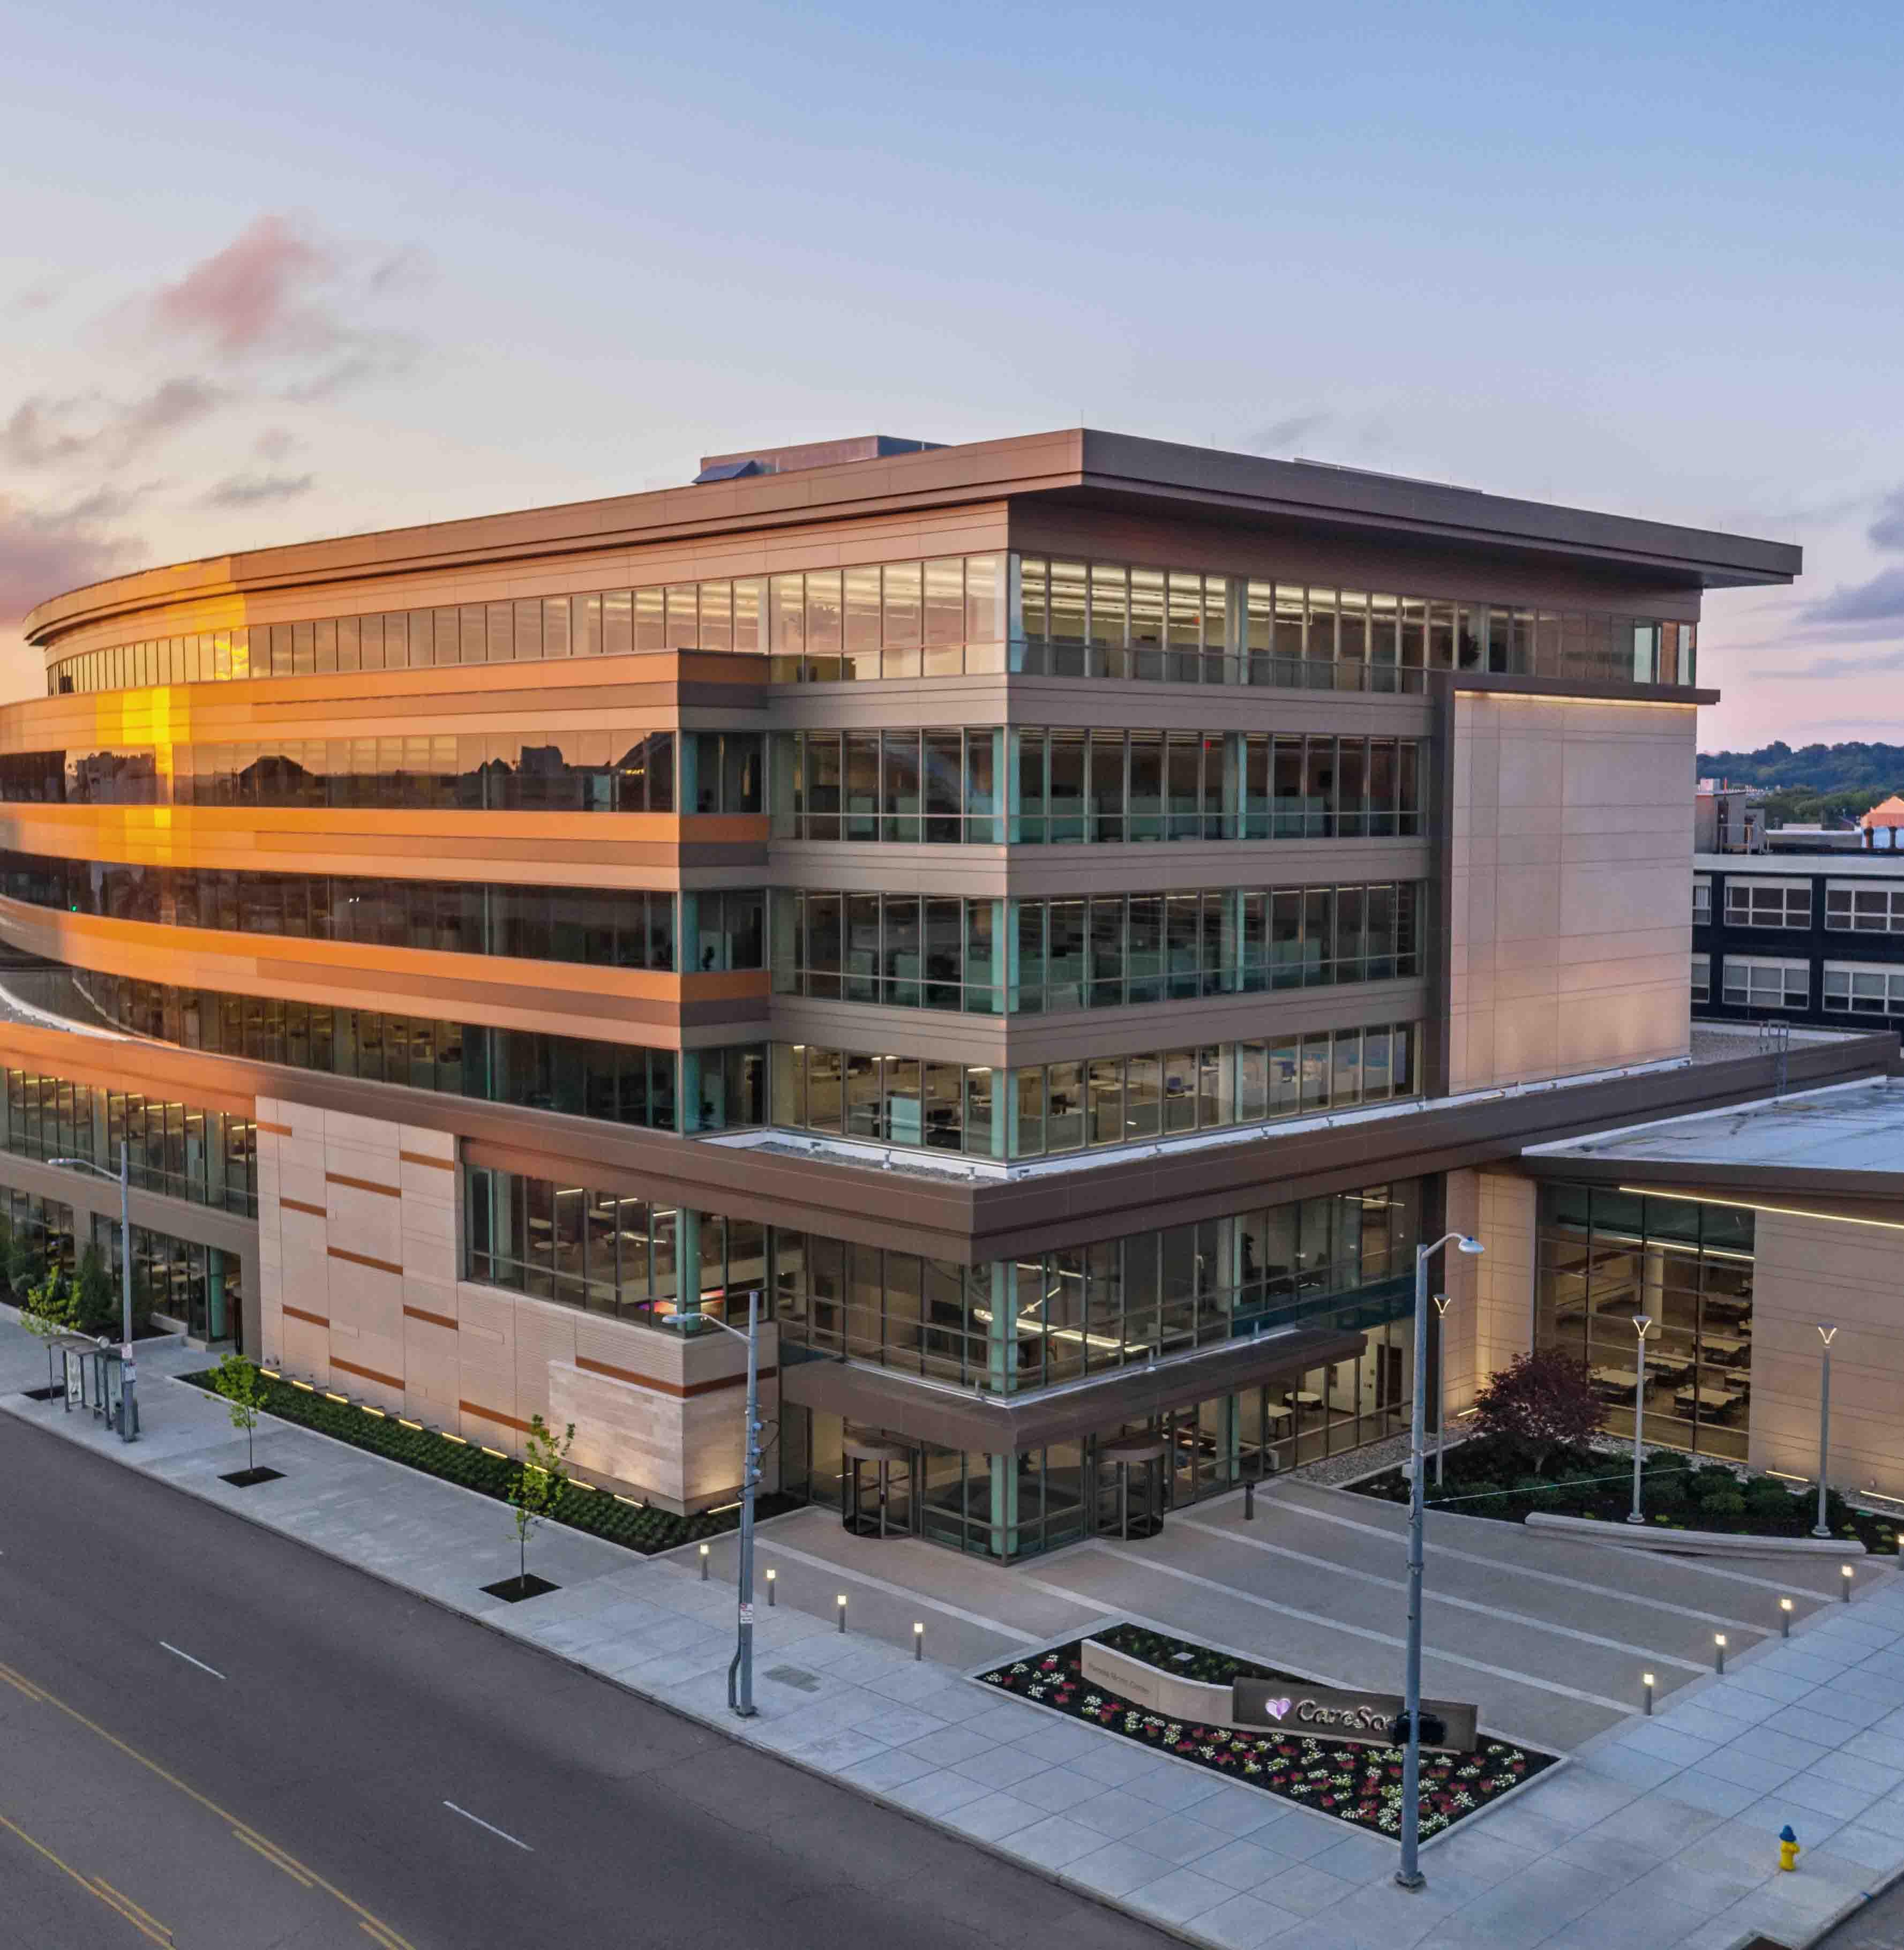 Exterior Pamela Morris Center for CareSource at dawn in Dayton, OH